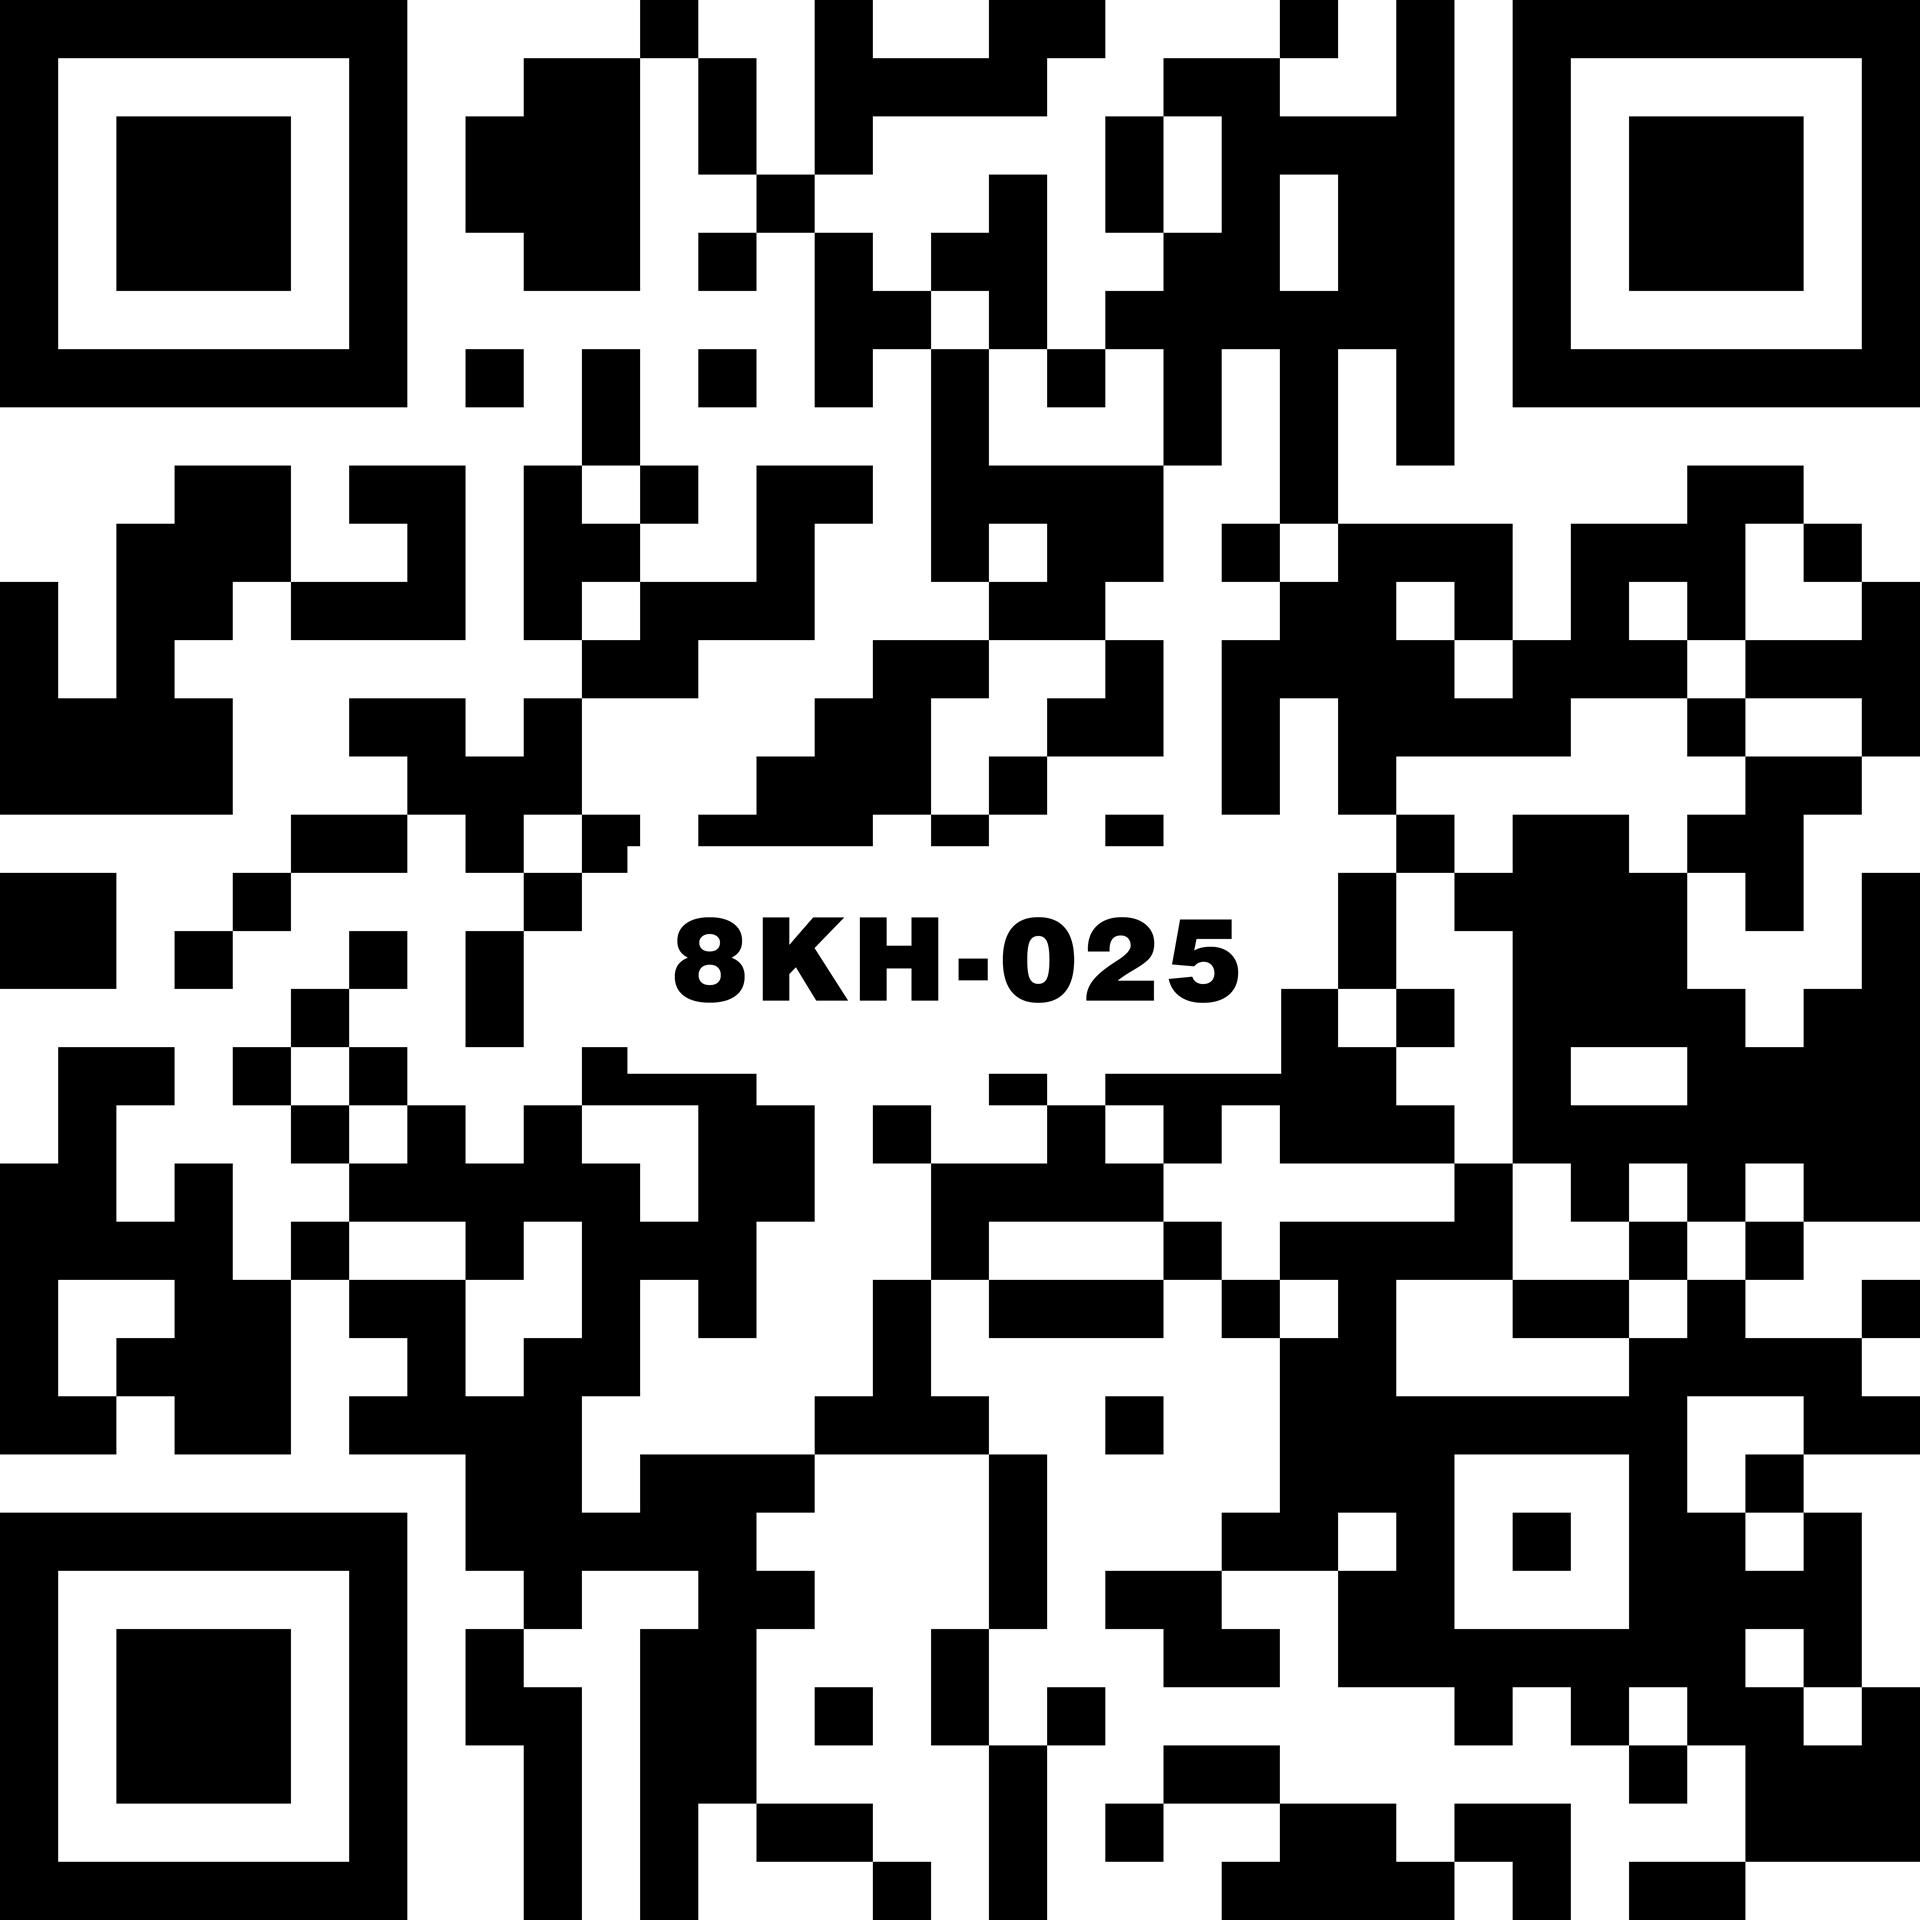 8KH-025